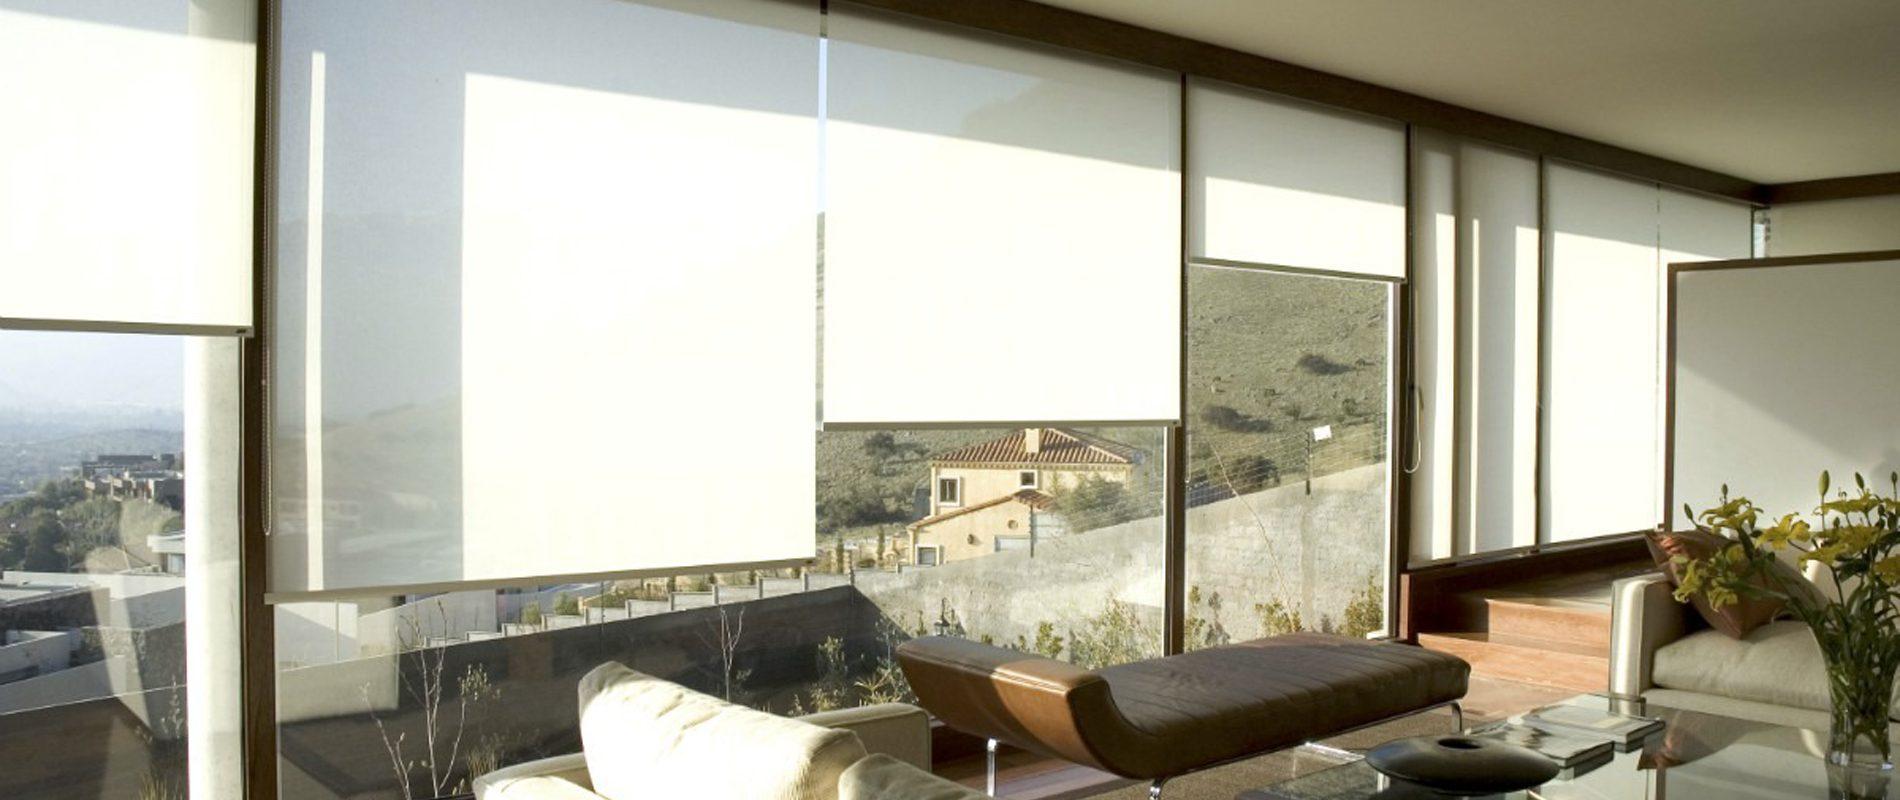 Ambiente com persiana rolô - portifólio